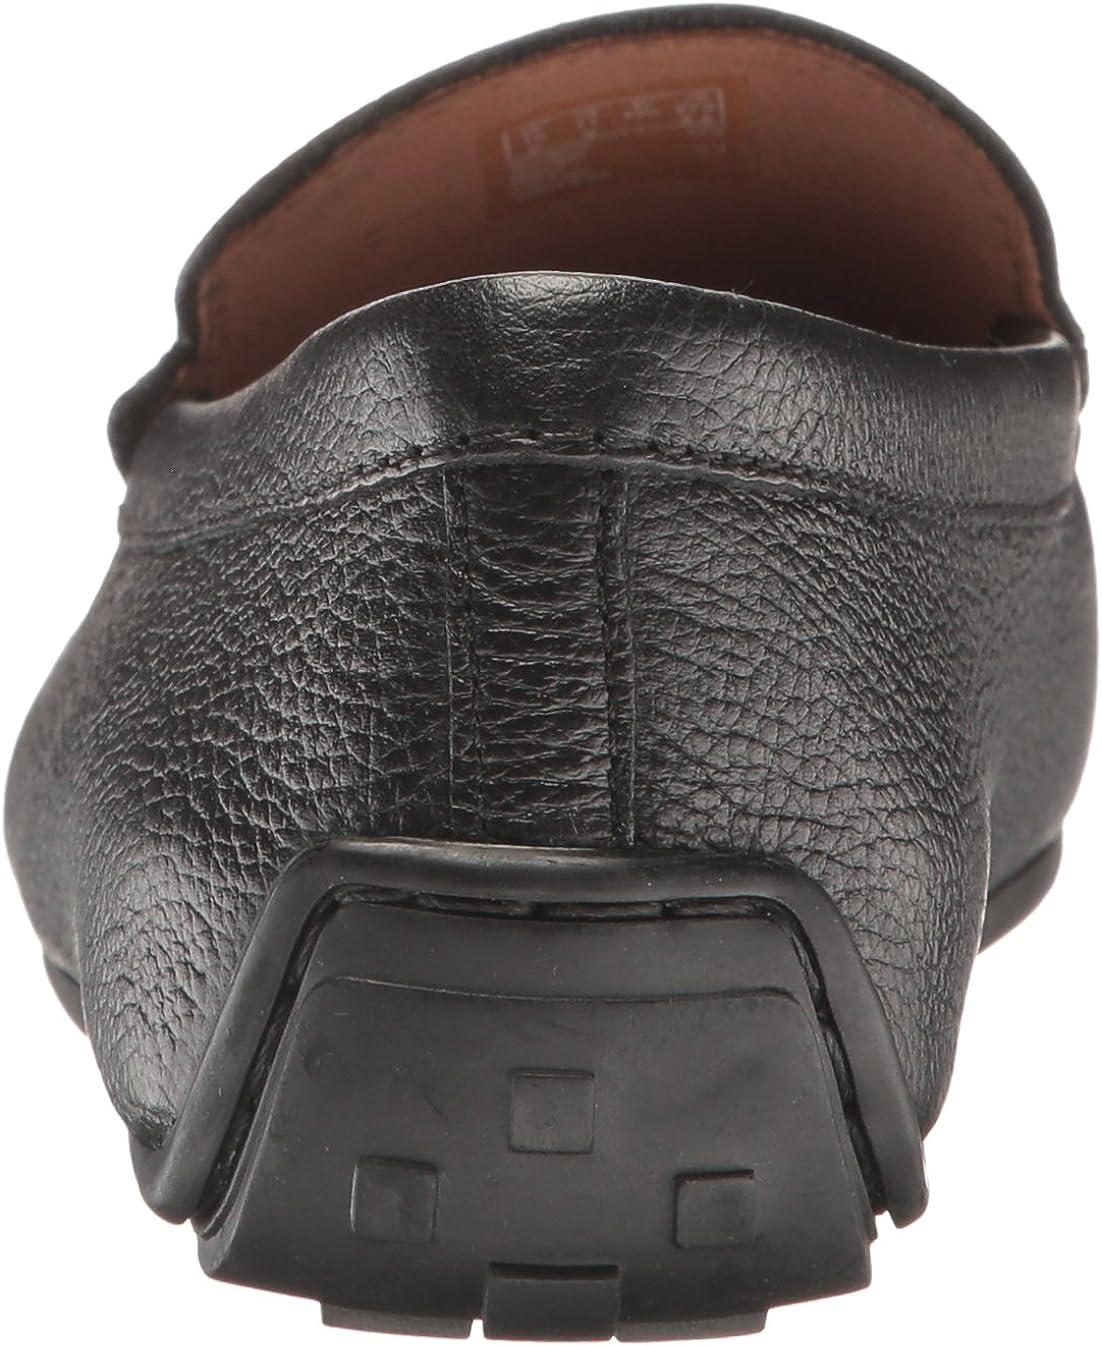 Details about  /Clarks Men/'s Reazor Edge Driving Style Loafer Choose SZ//color